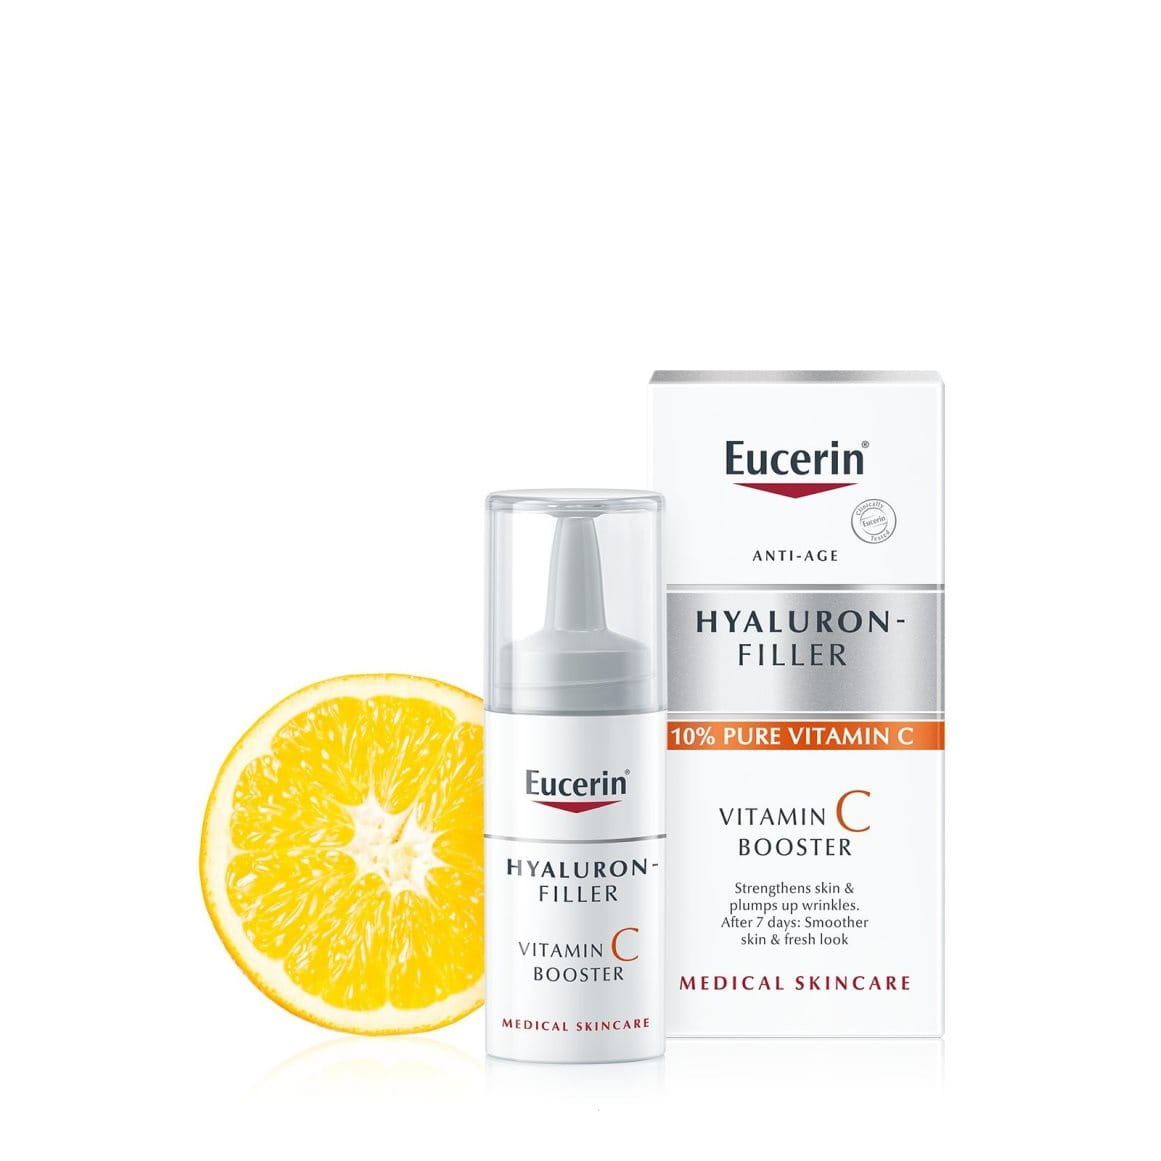 Hyaluron Filler Vitamin C Booster